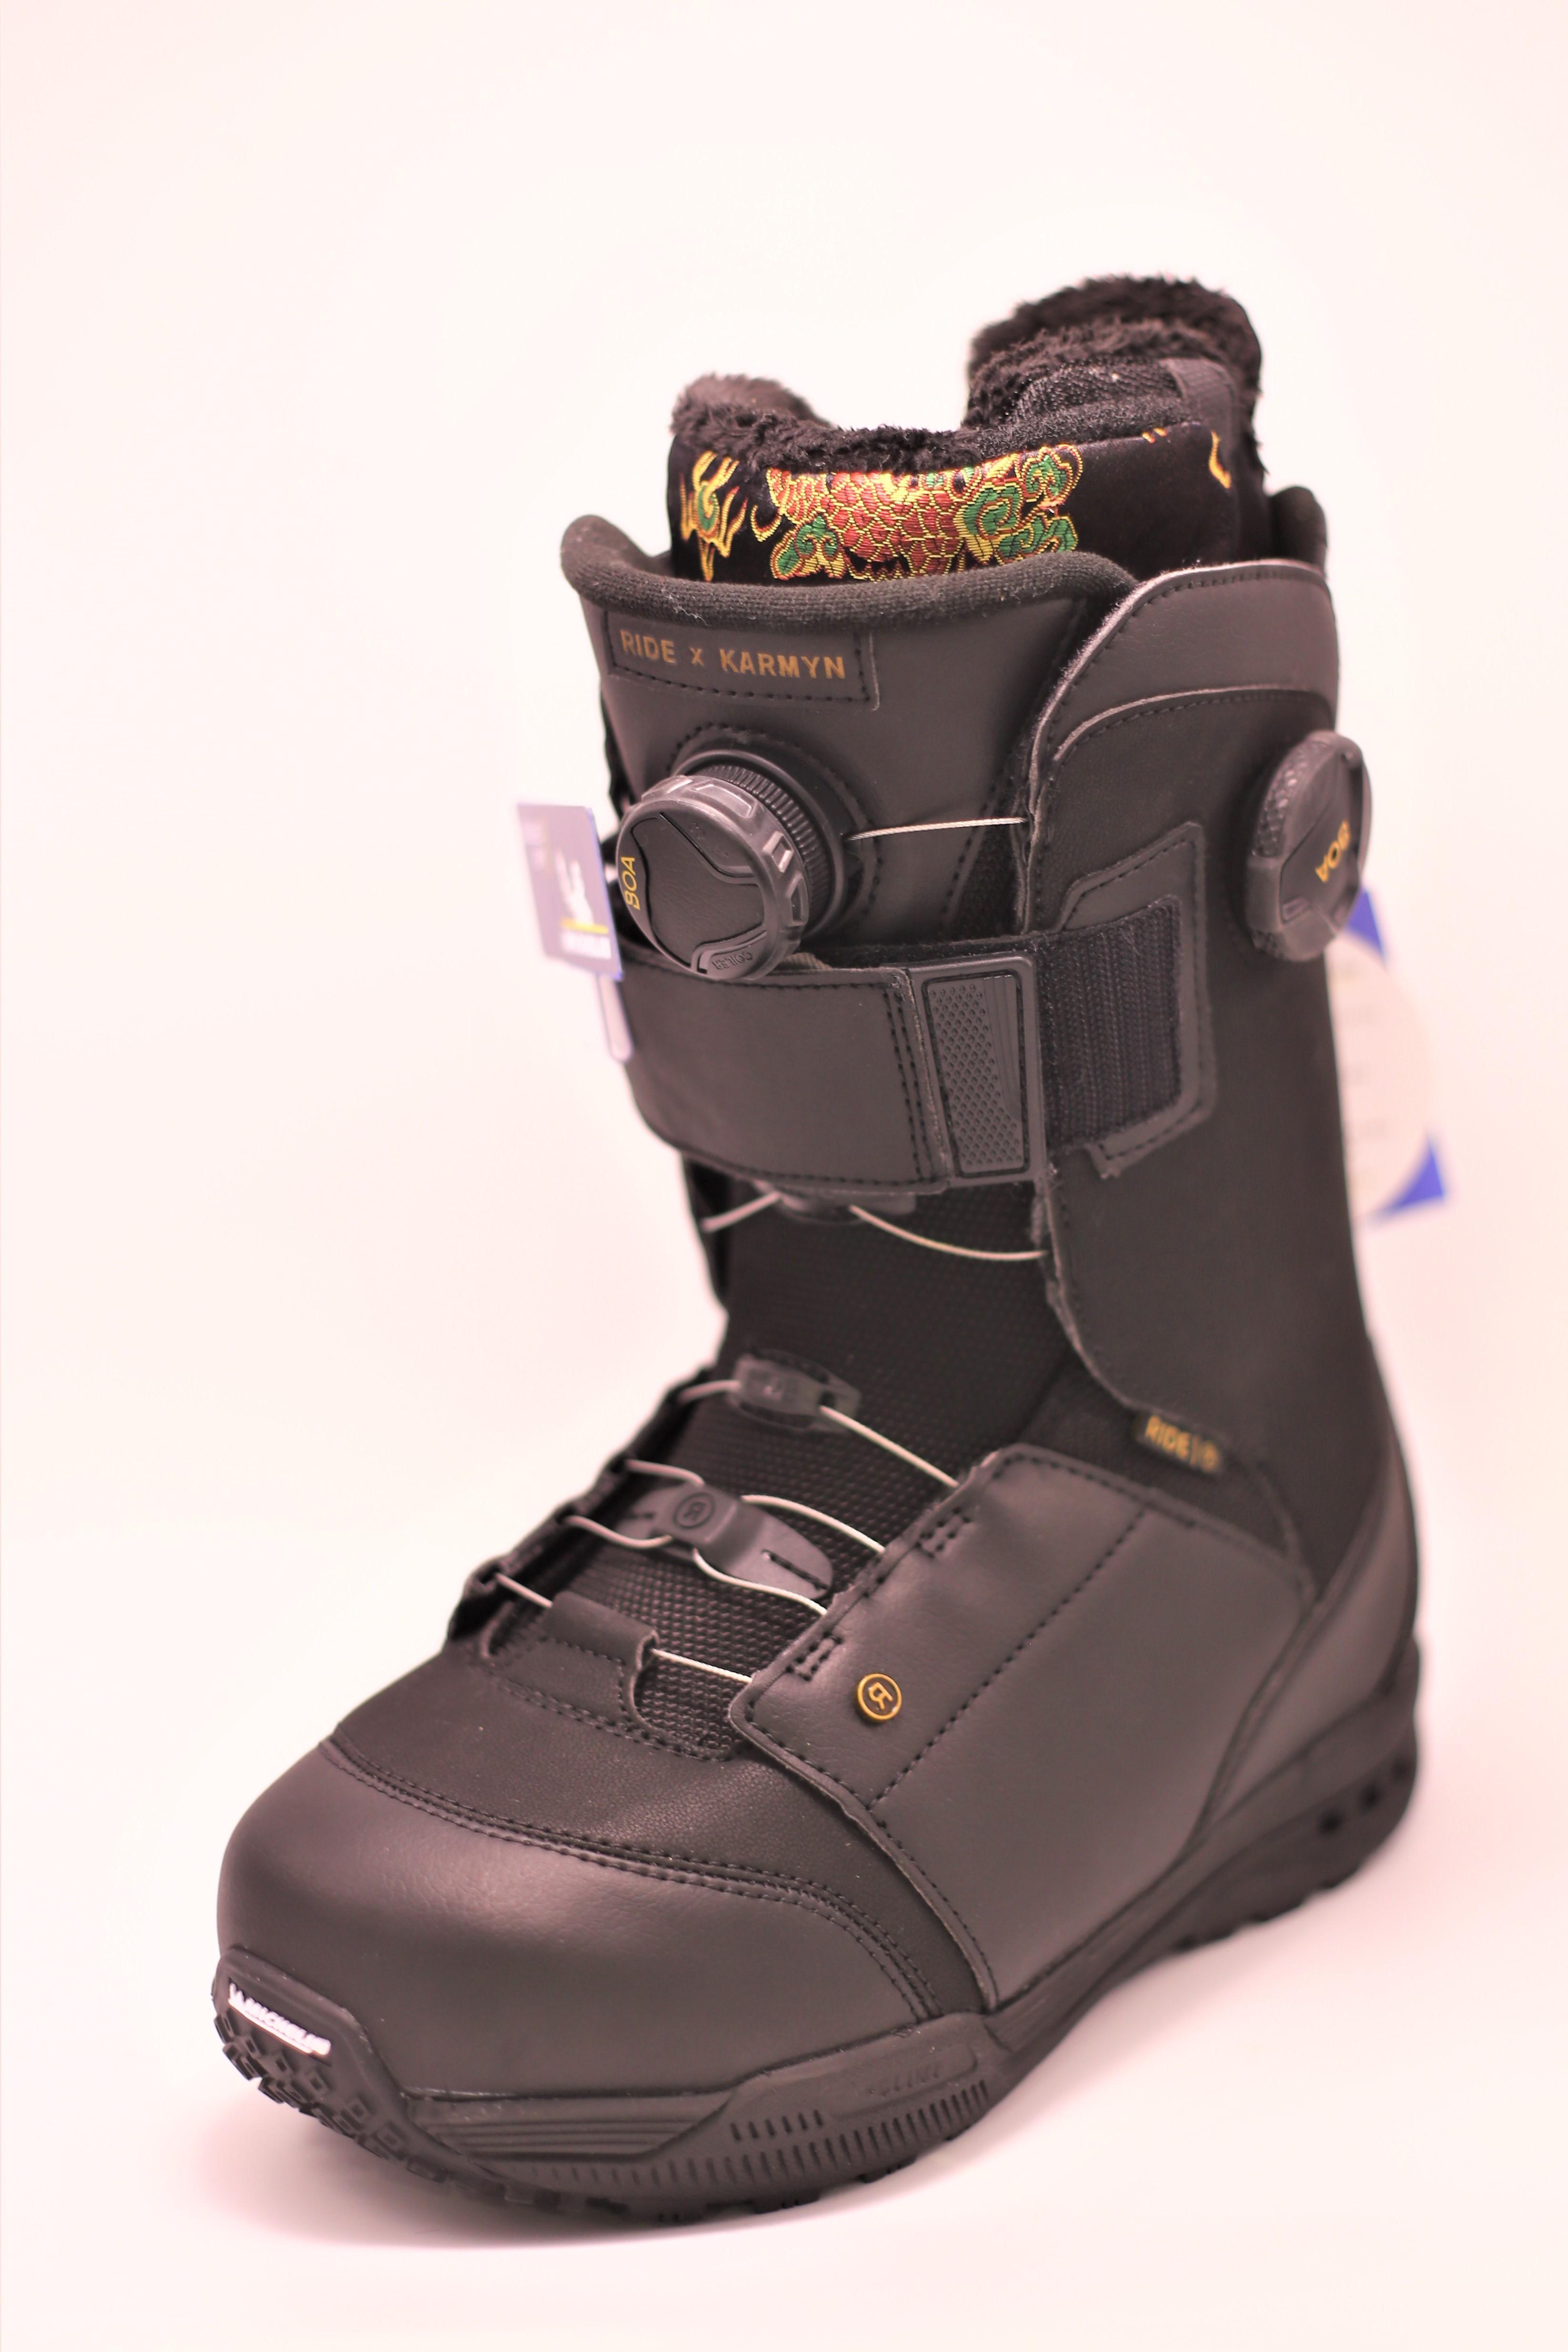 9a0cbddec9052 2020 Ride Karmyn Women s Boot